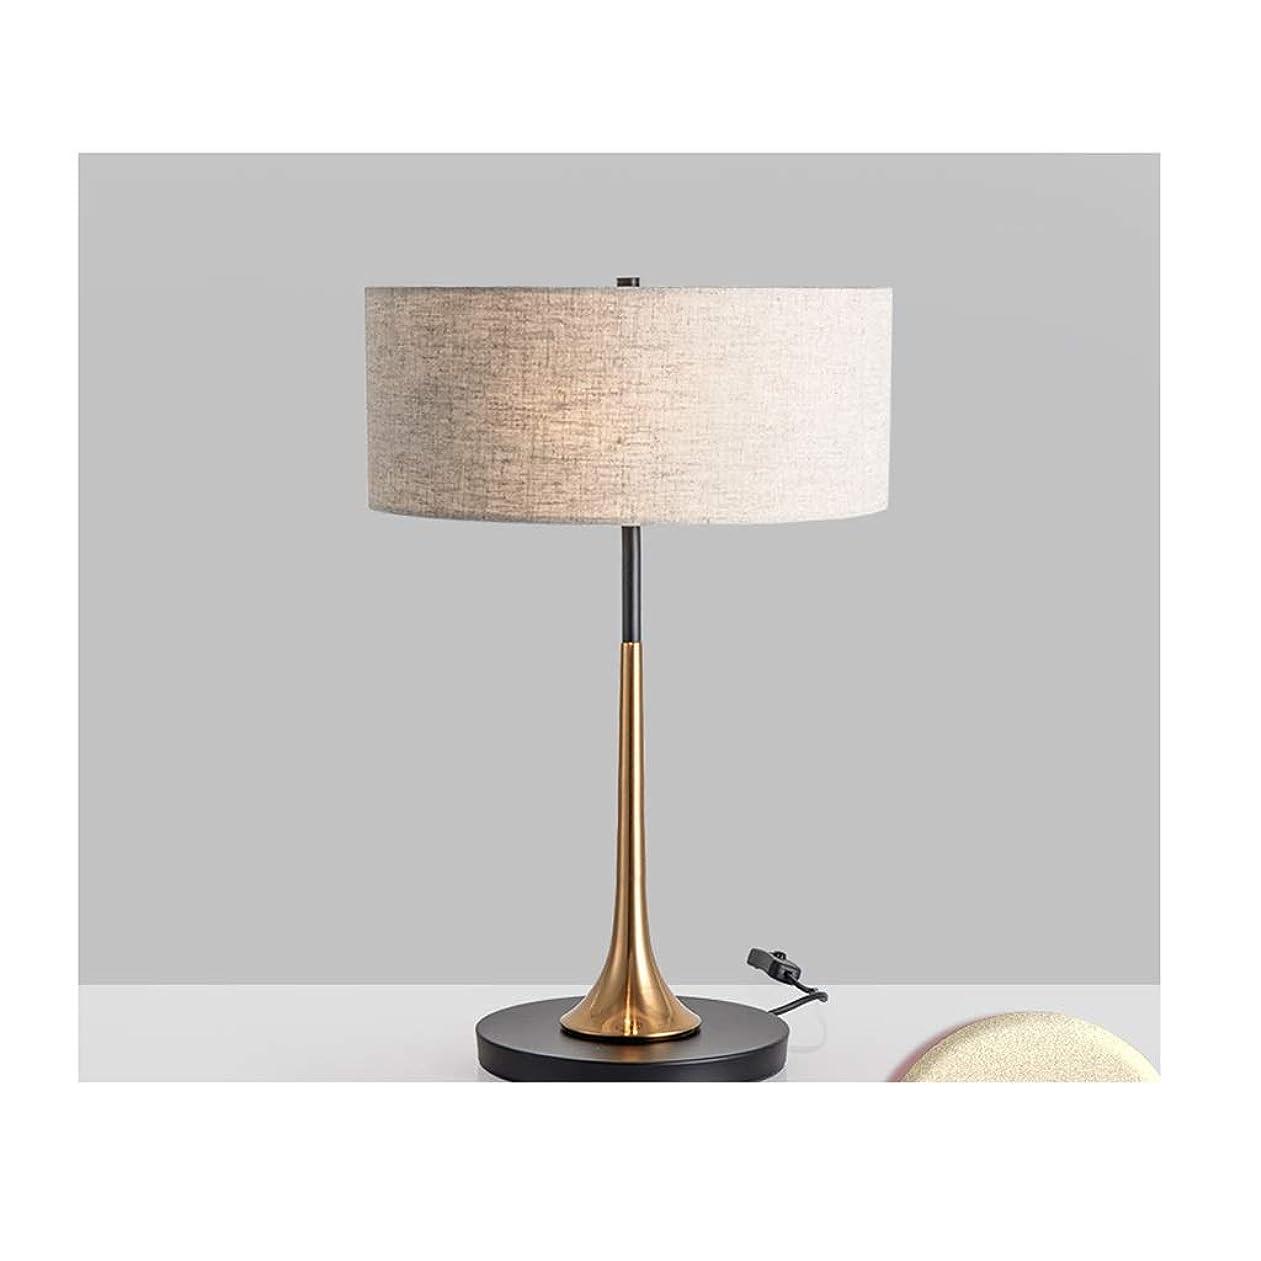 IUYWLテーブルランプ 寝室のテーブルランプのベッドサイドランプの金属ベースの生地のランプシェードは、リビングルームの研究寝室のホテルなどで使用することができます IUYWLテーブルランプ